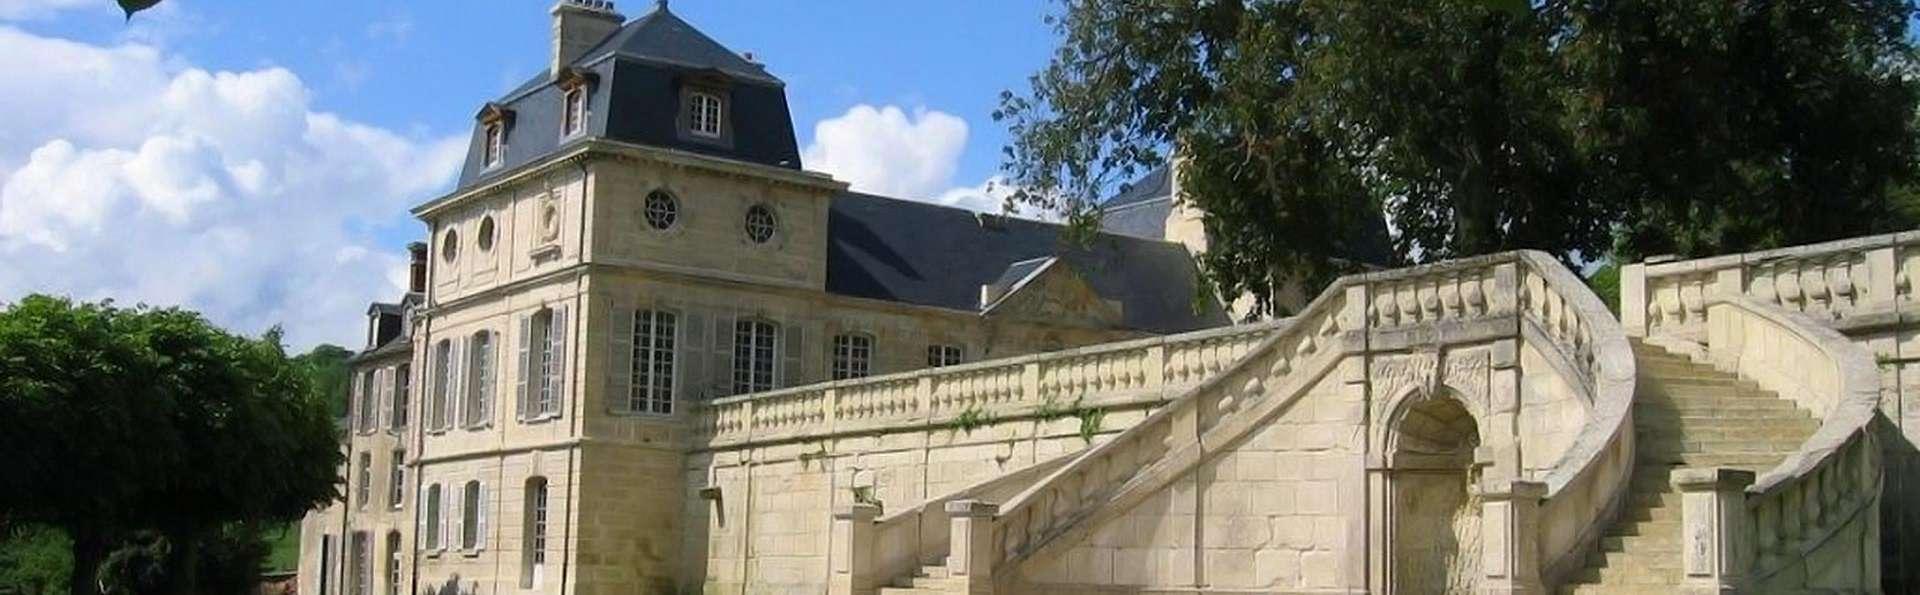 Novotel Château de Maffliers - edit_castel.jpg